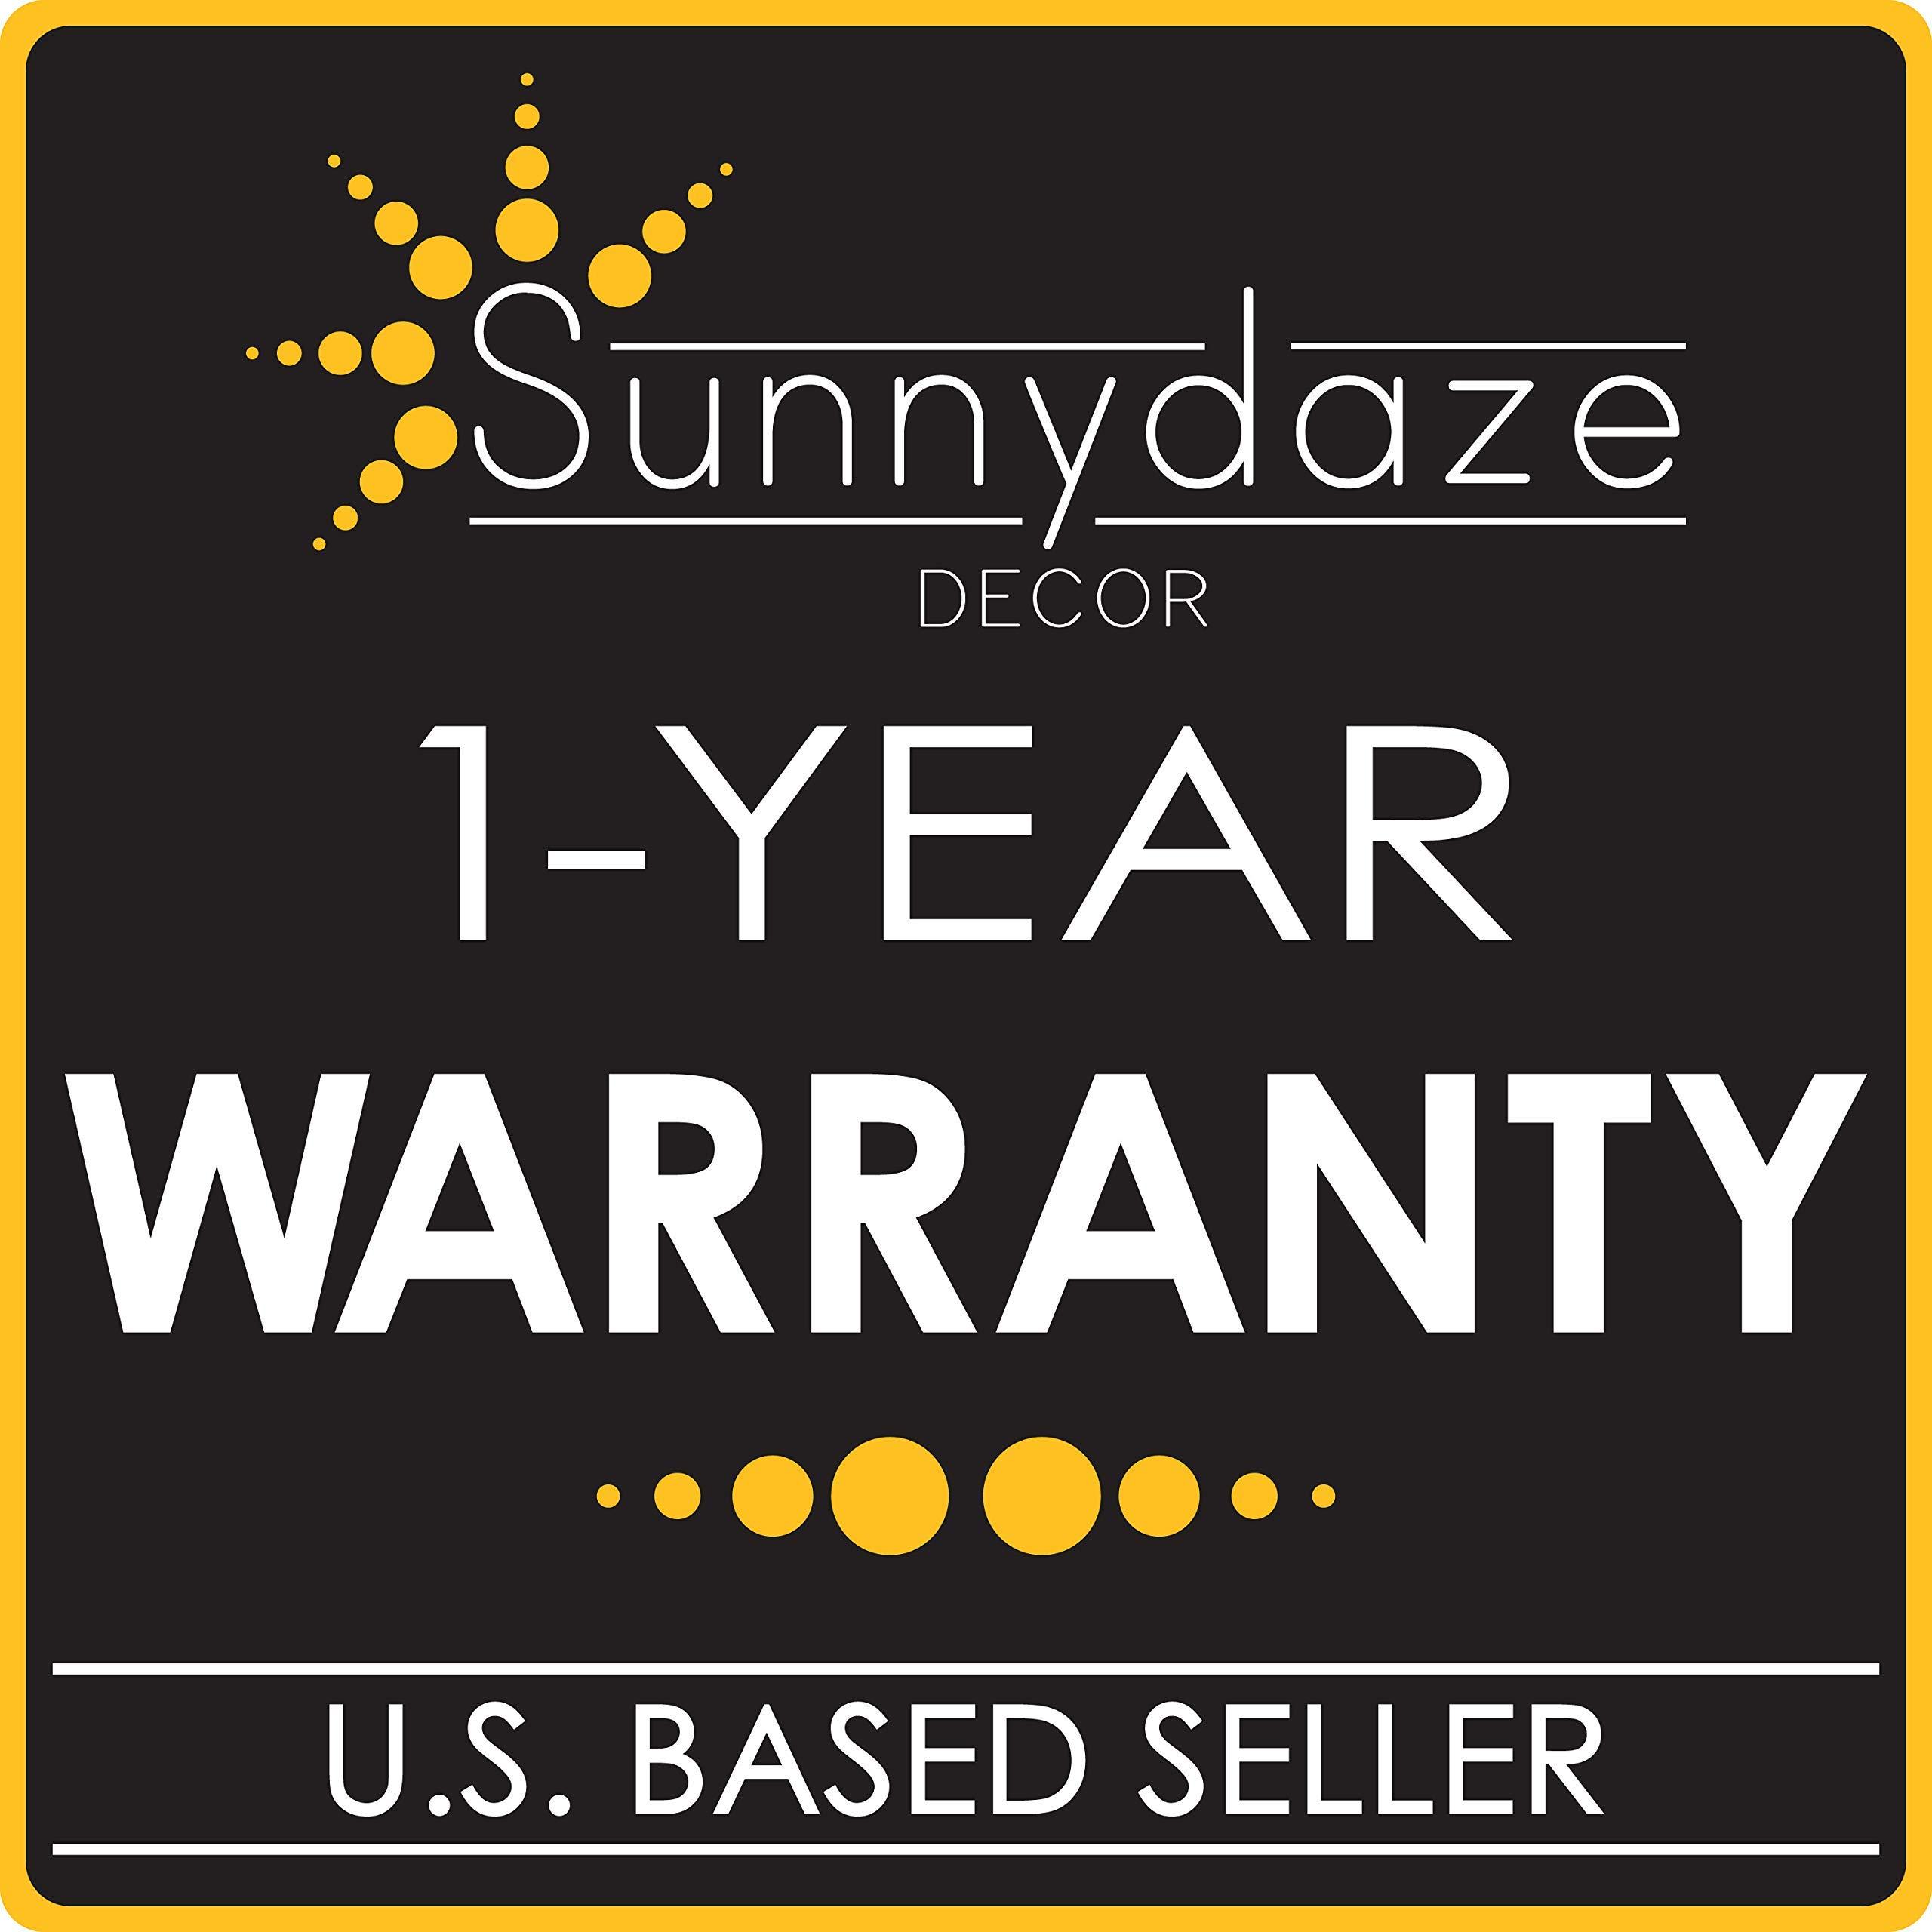 Sunnydaze Outdoor Fire Pit Spark Screen Cover, Round Heavy-Duty Steel Mesh Lid, 30-Inch (Renewed) by Sunnydaze Decor